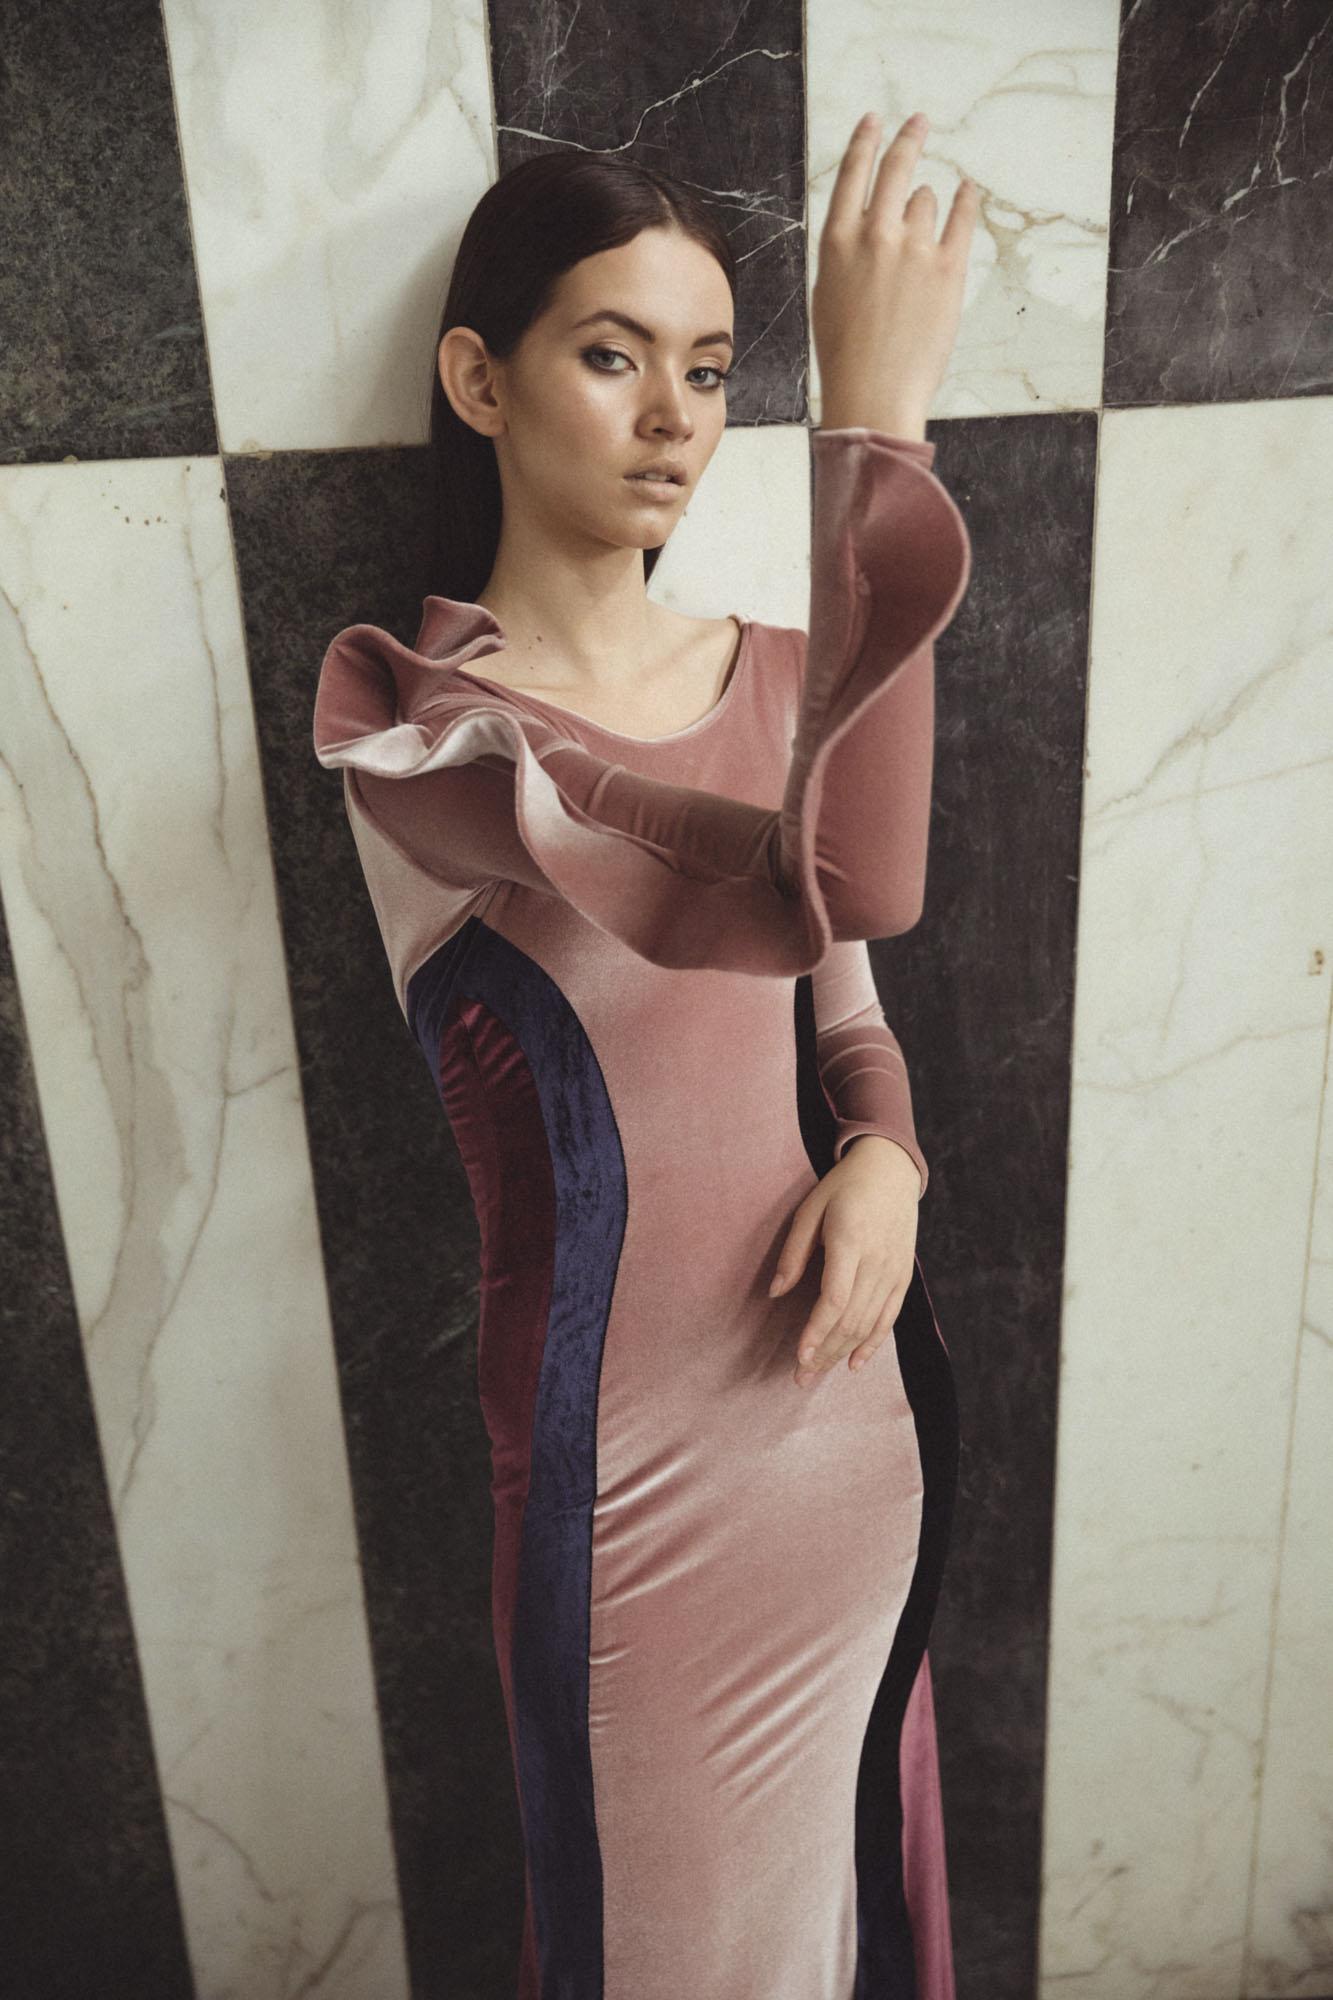 efrain_mogollon_femineus_niza_ dress.JPG